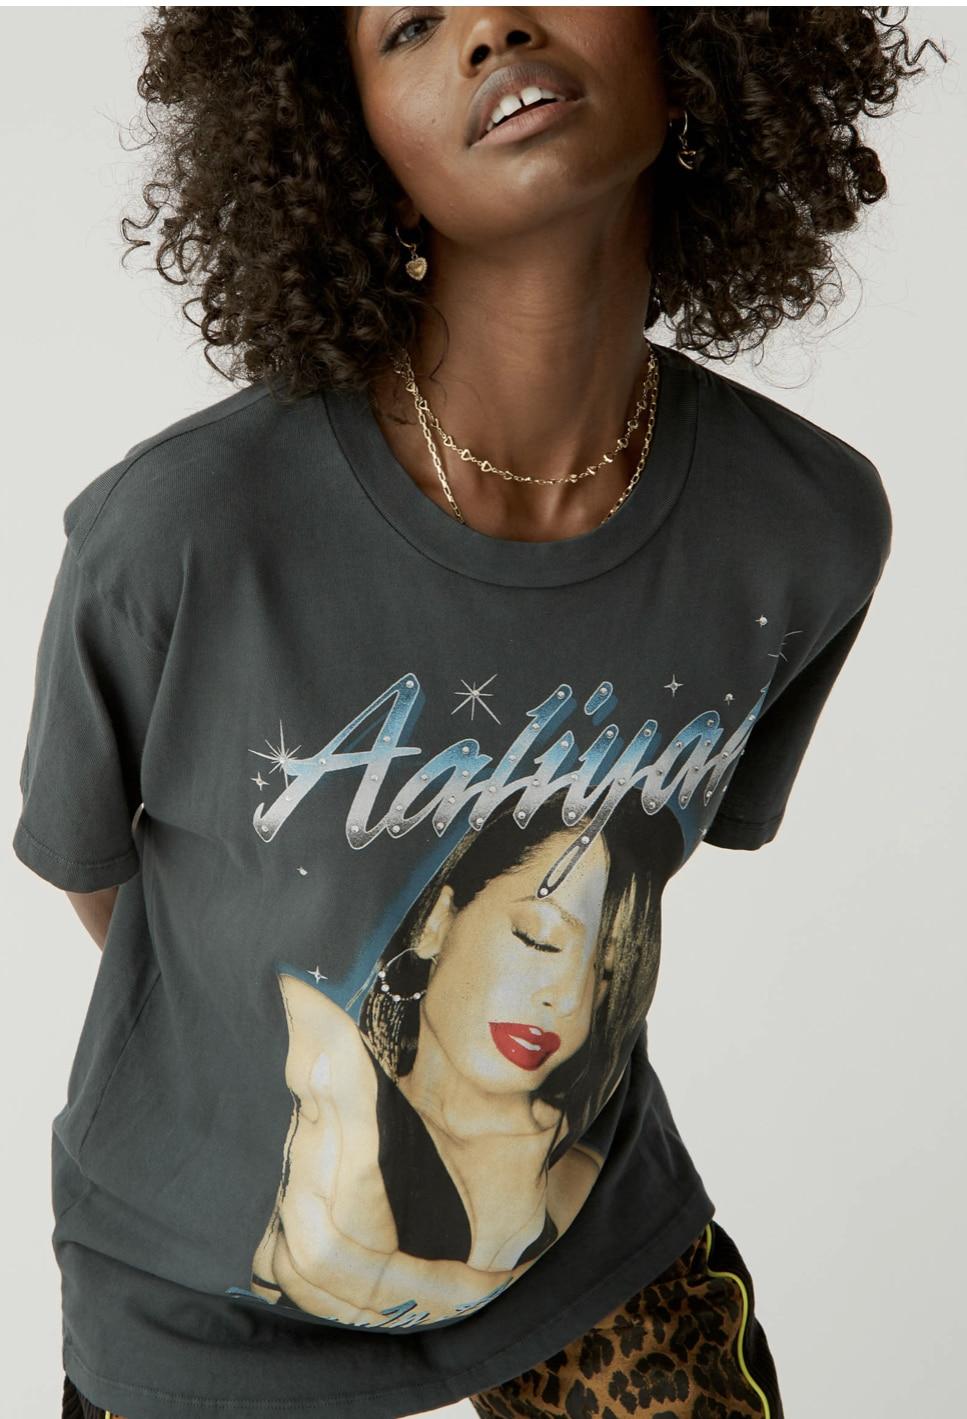 Aaliyah One In A Million Weekend Tee